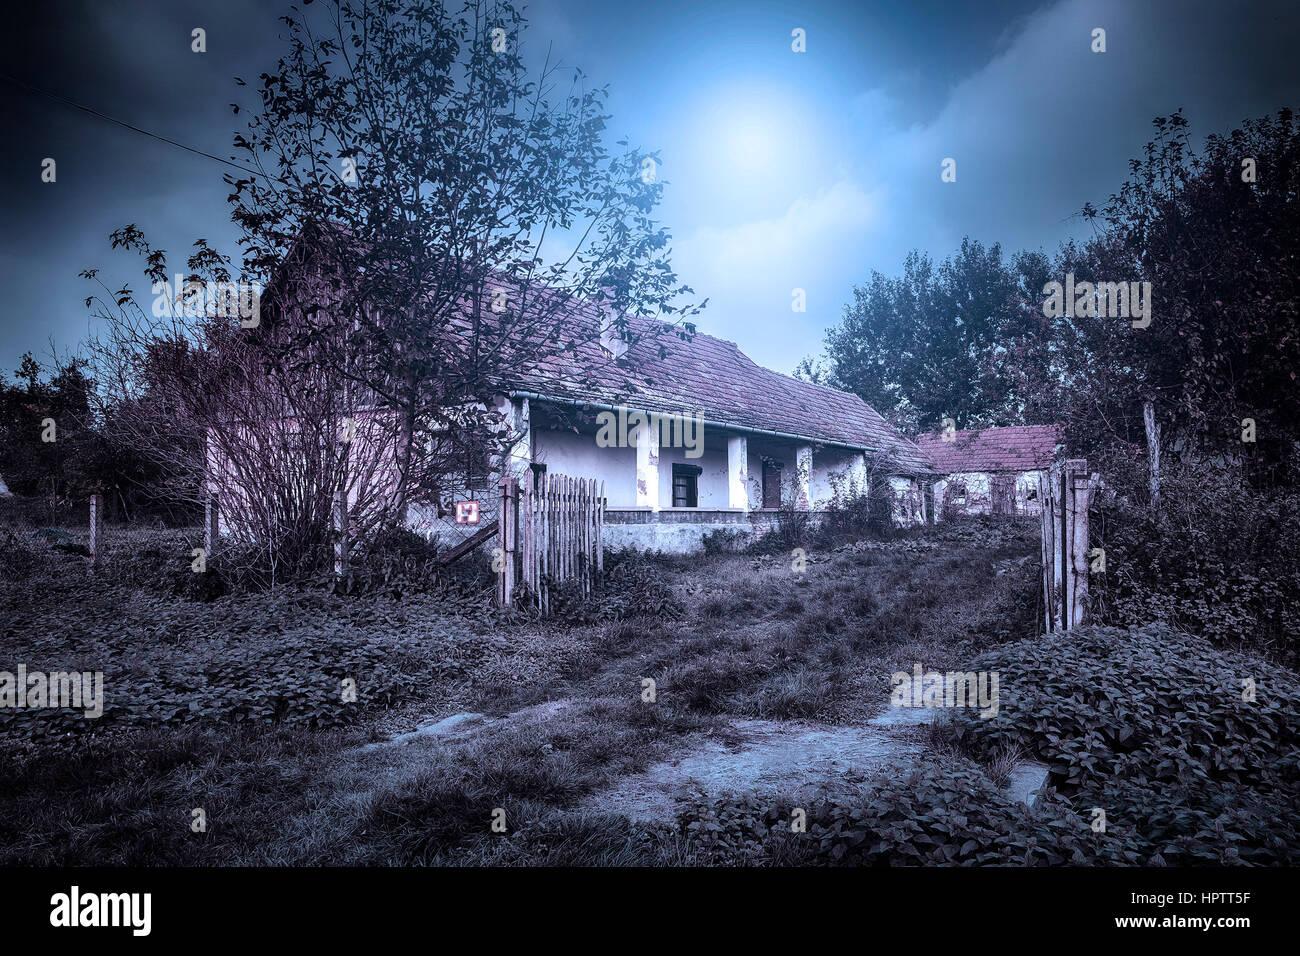 Vieille maison abandonnée spooky ghost Photo Stock